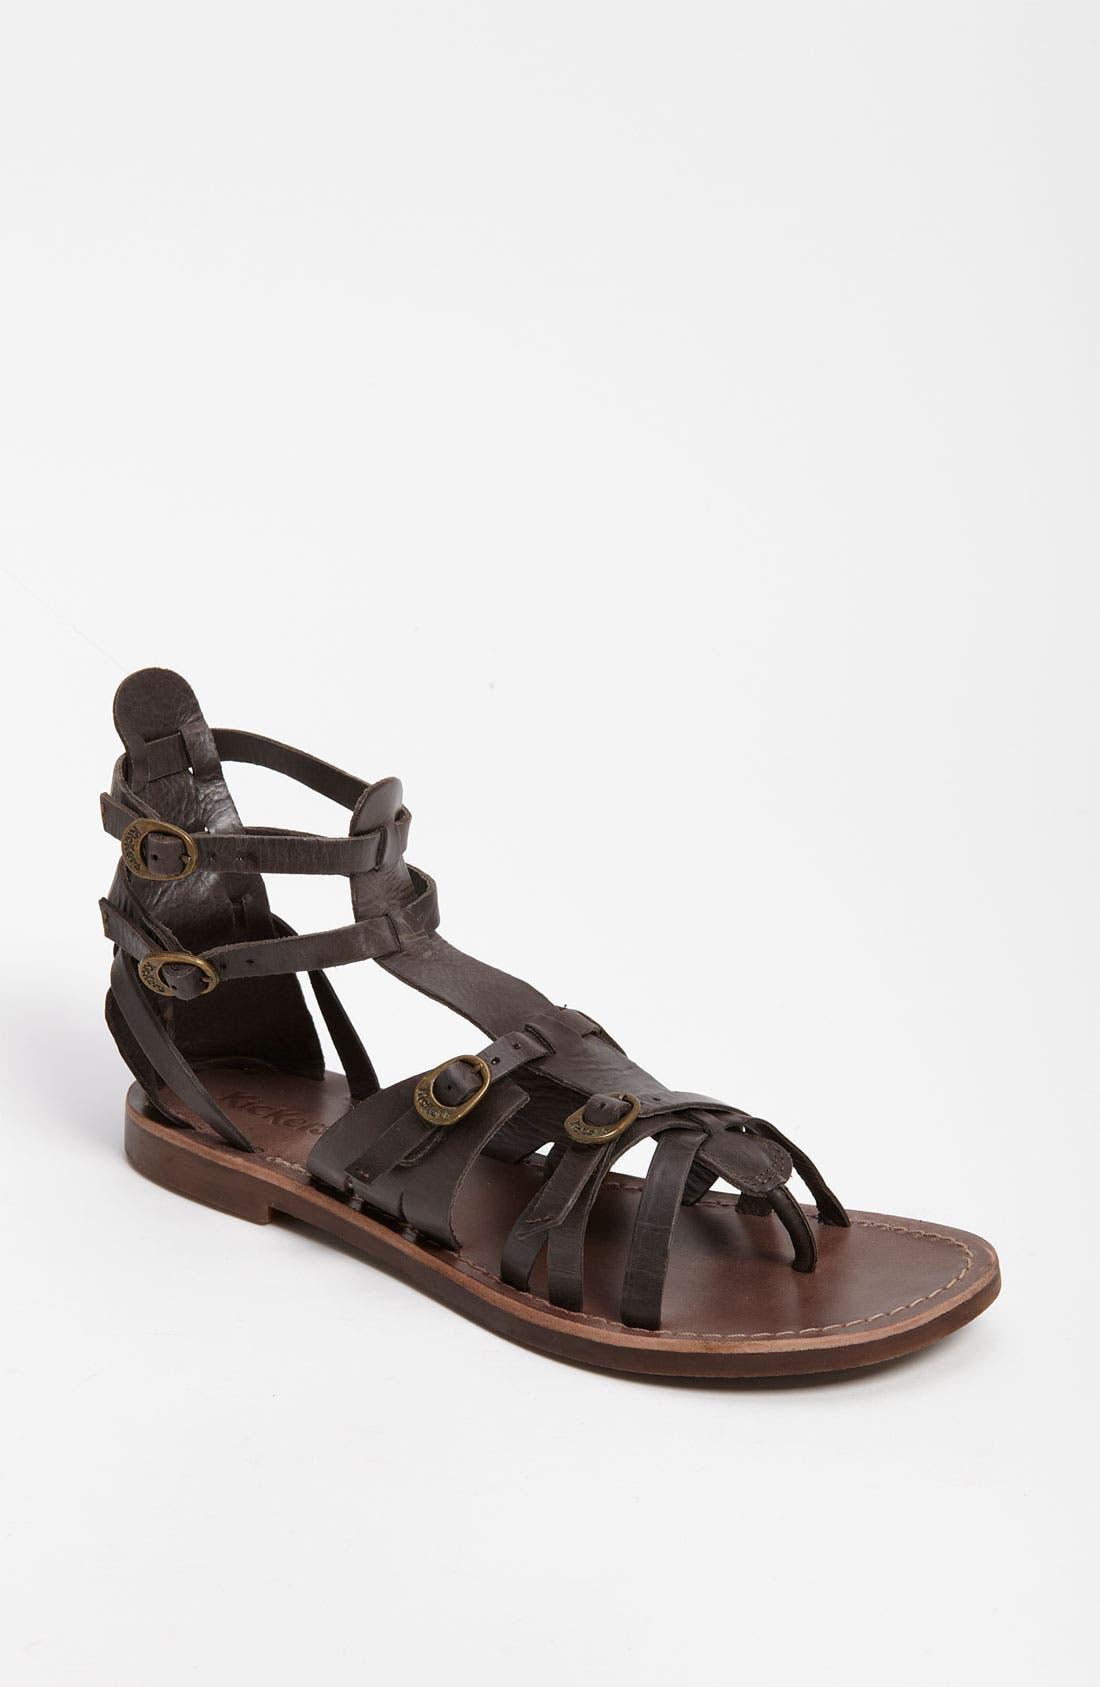 Main Image - Kickers 'Divas' Sandal